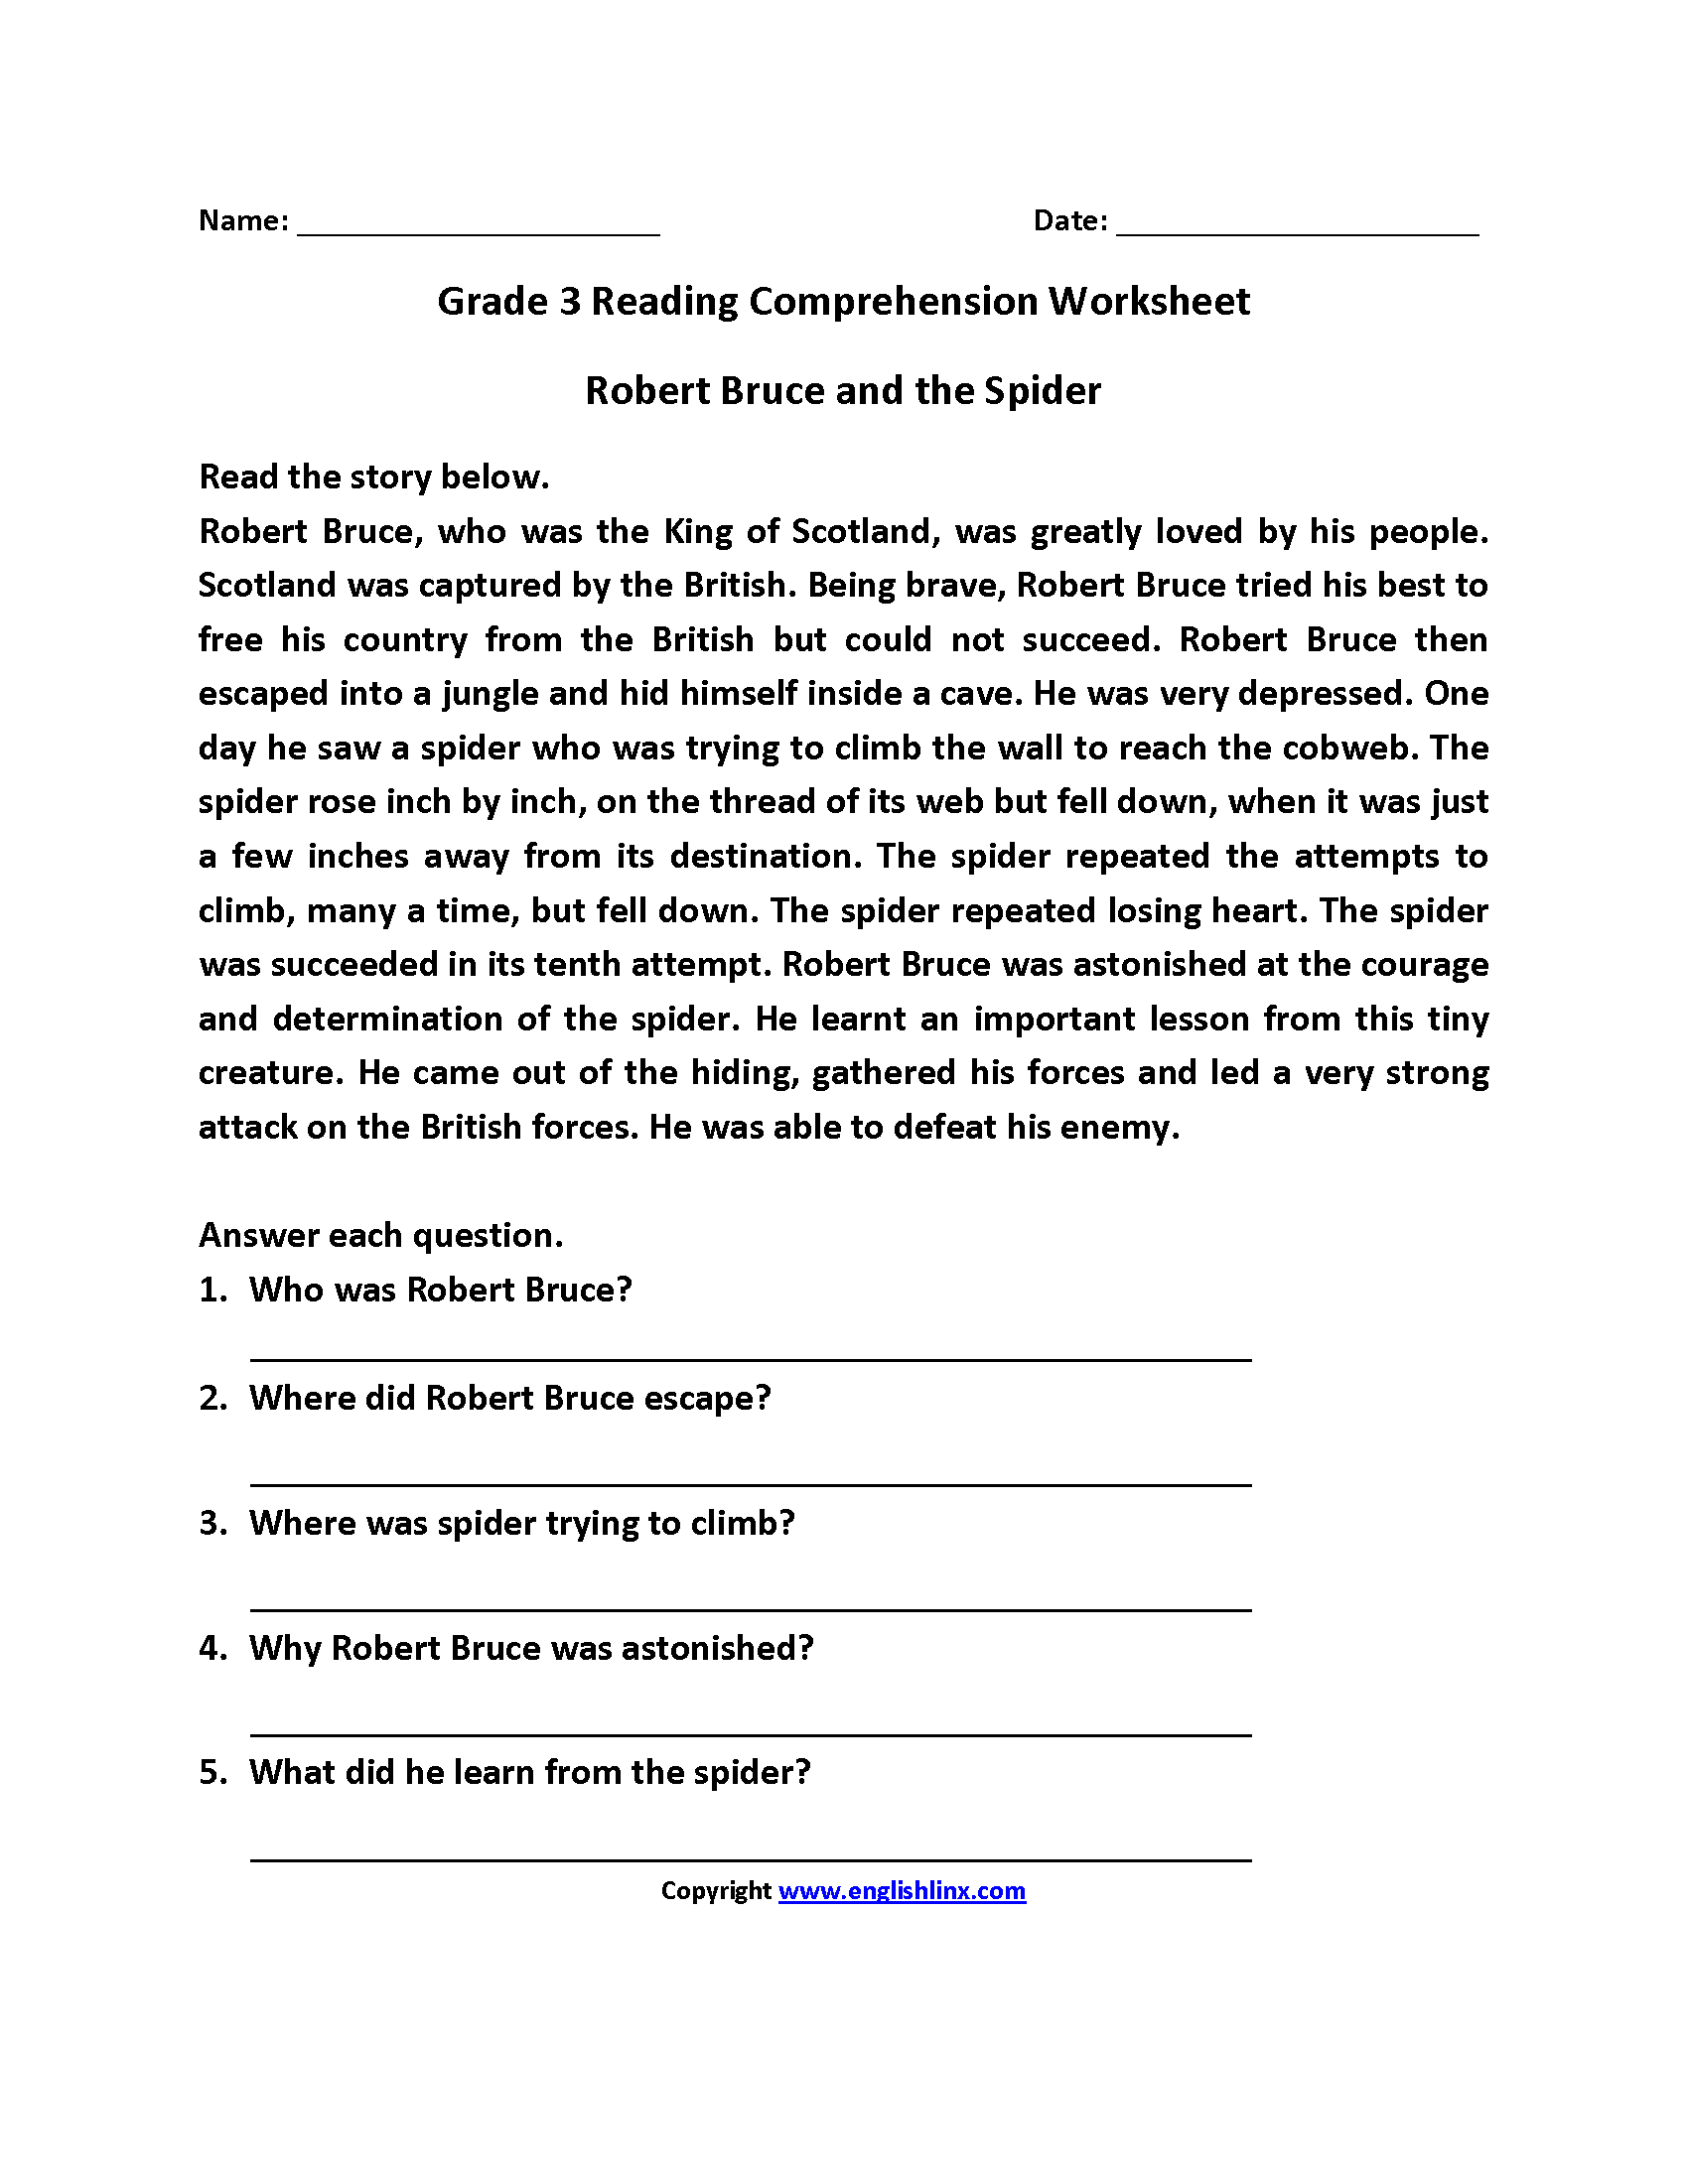 Robert Bruce and Spider Third Grade Reading Worksheets   Reading  comprehension worksheets [ 2200 x 1700 Pixel ]